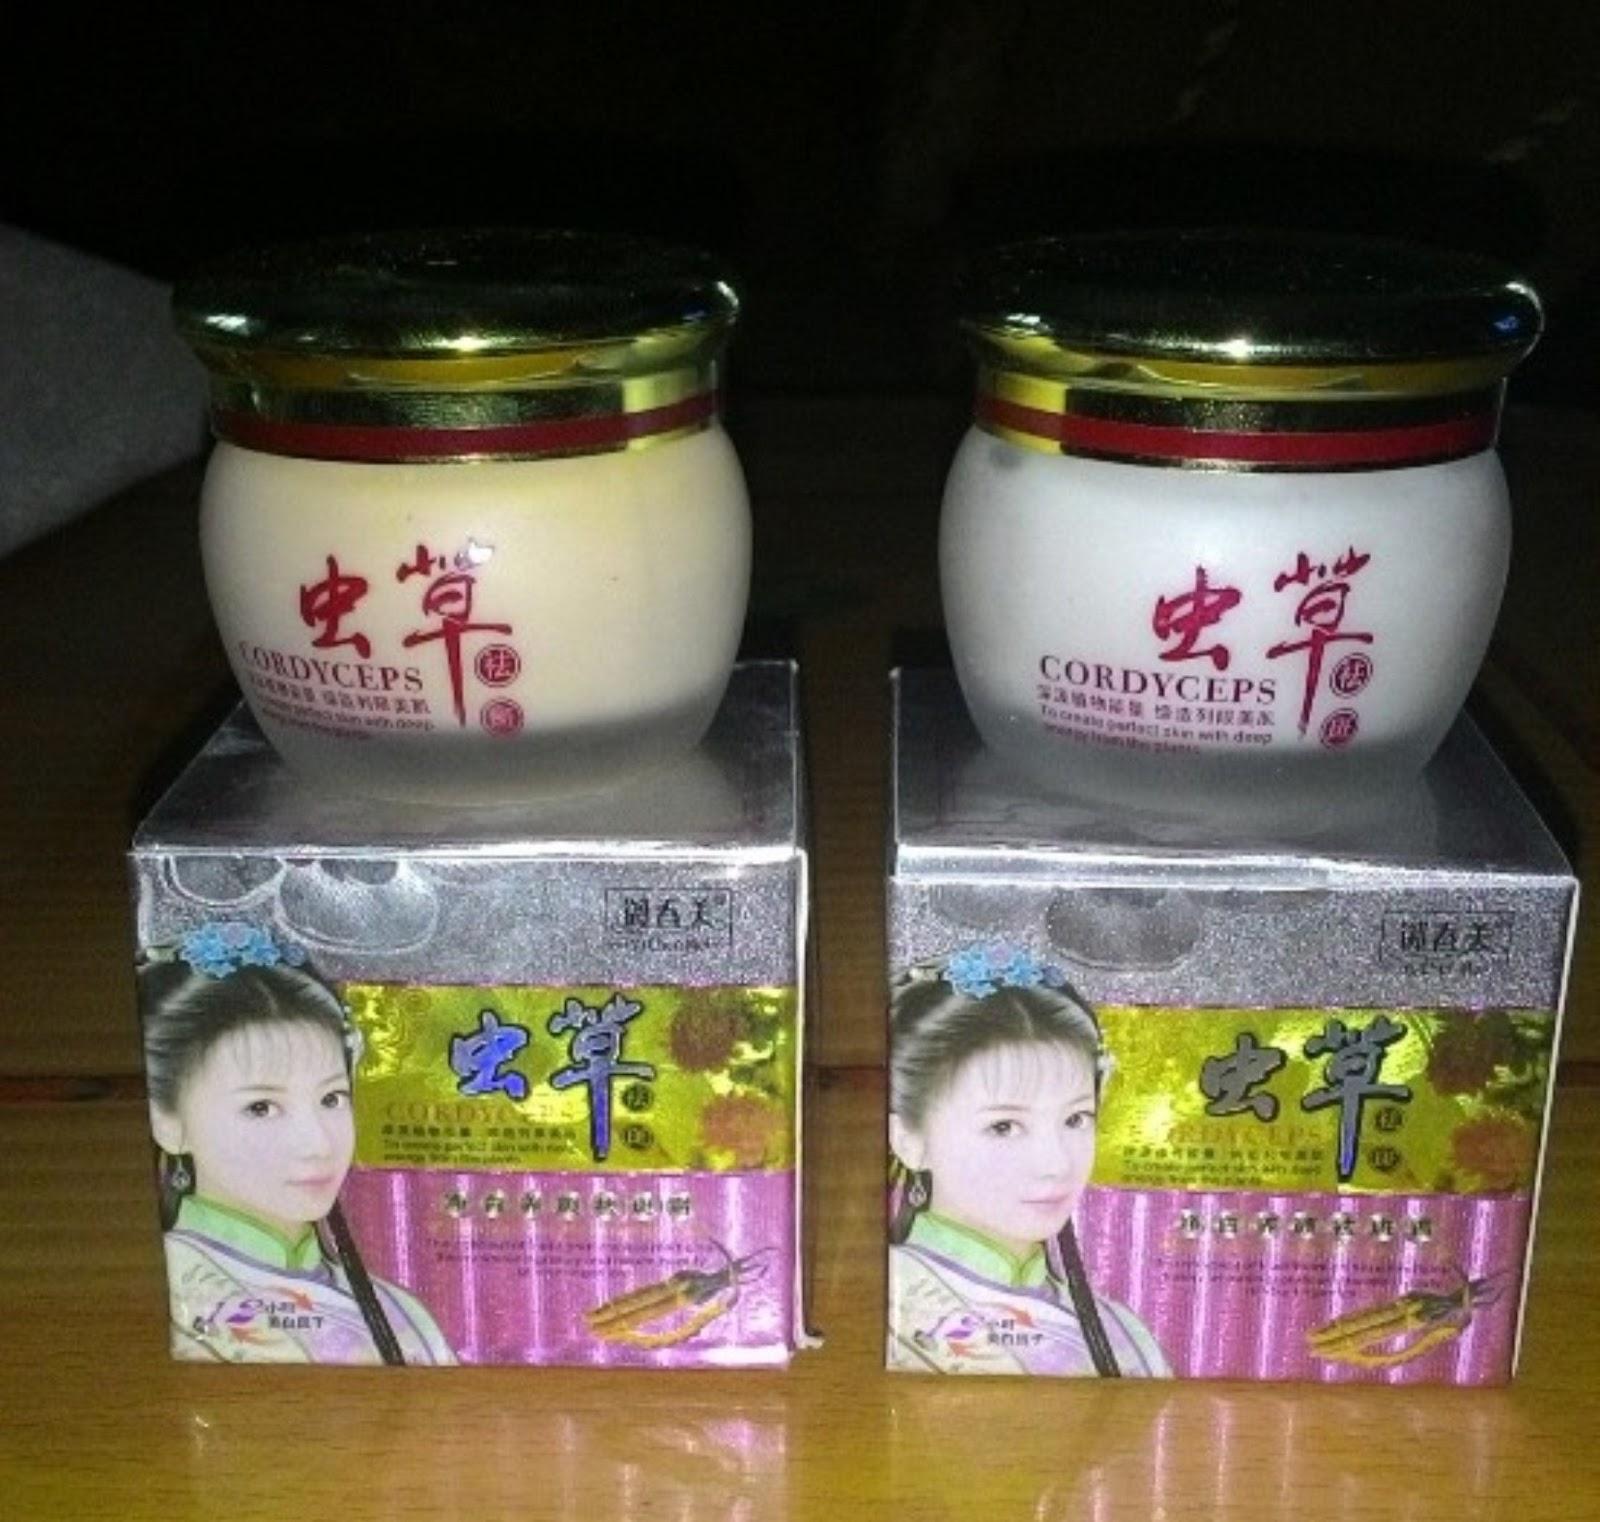 Toko Kosmetik Herbal Original September 2015 Cordysep Night Cream Krim Malam Terbuat Dari Alami Yang Tumbuh Di Dataran China Sehingga Mempunyai Banyak Khasiat Dipercaya Sangat Ampuh Untuk Menghilangkan